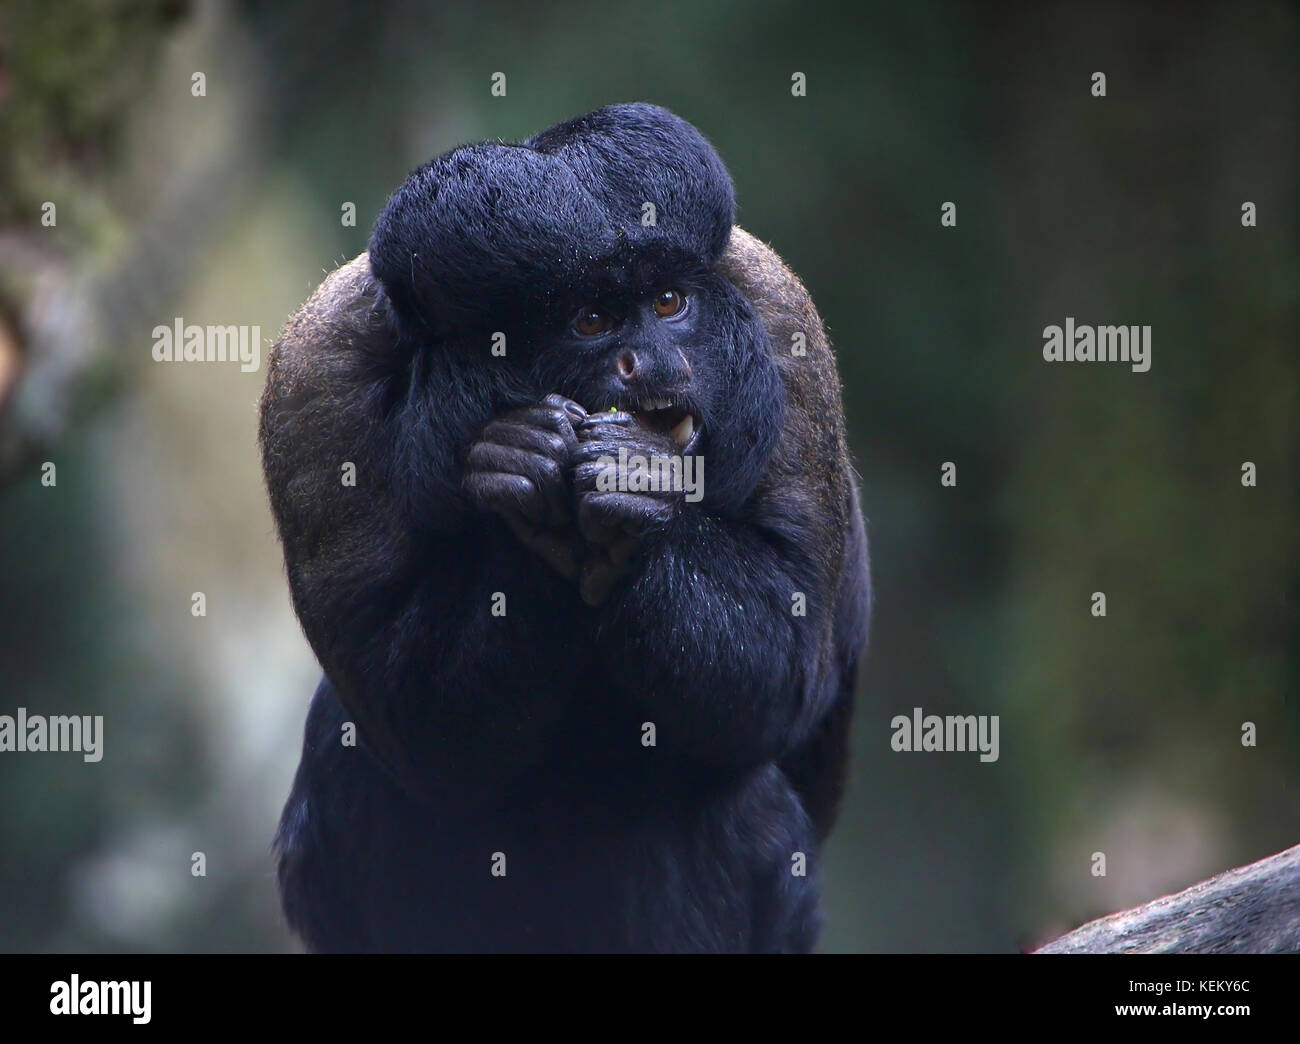 Bearded Monkey Name: Bearded Saki Monkey Stock Photos & Bearded Saki Monkey